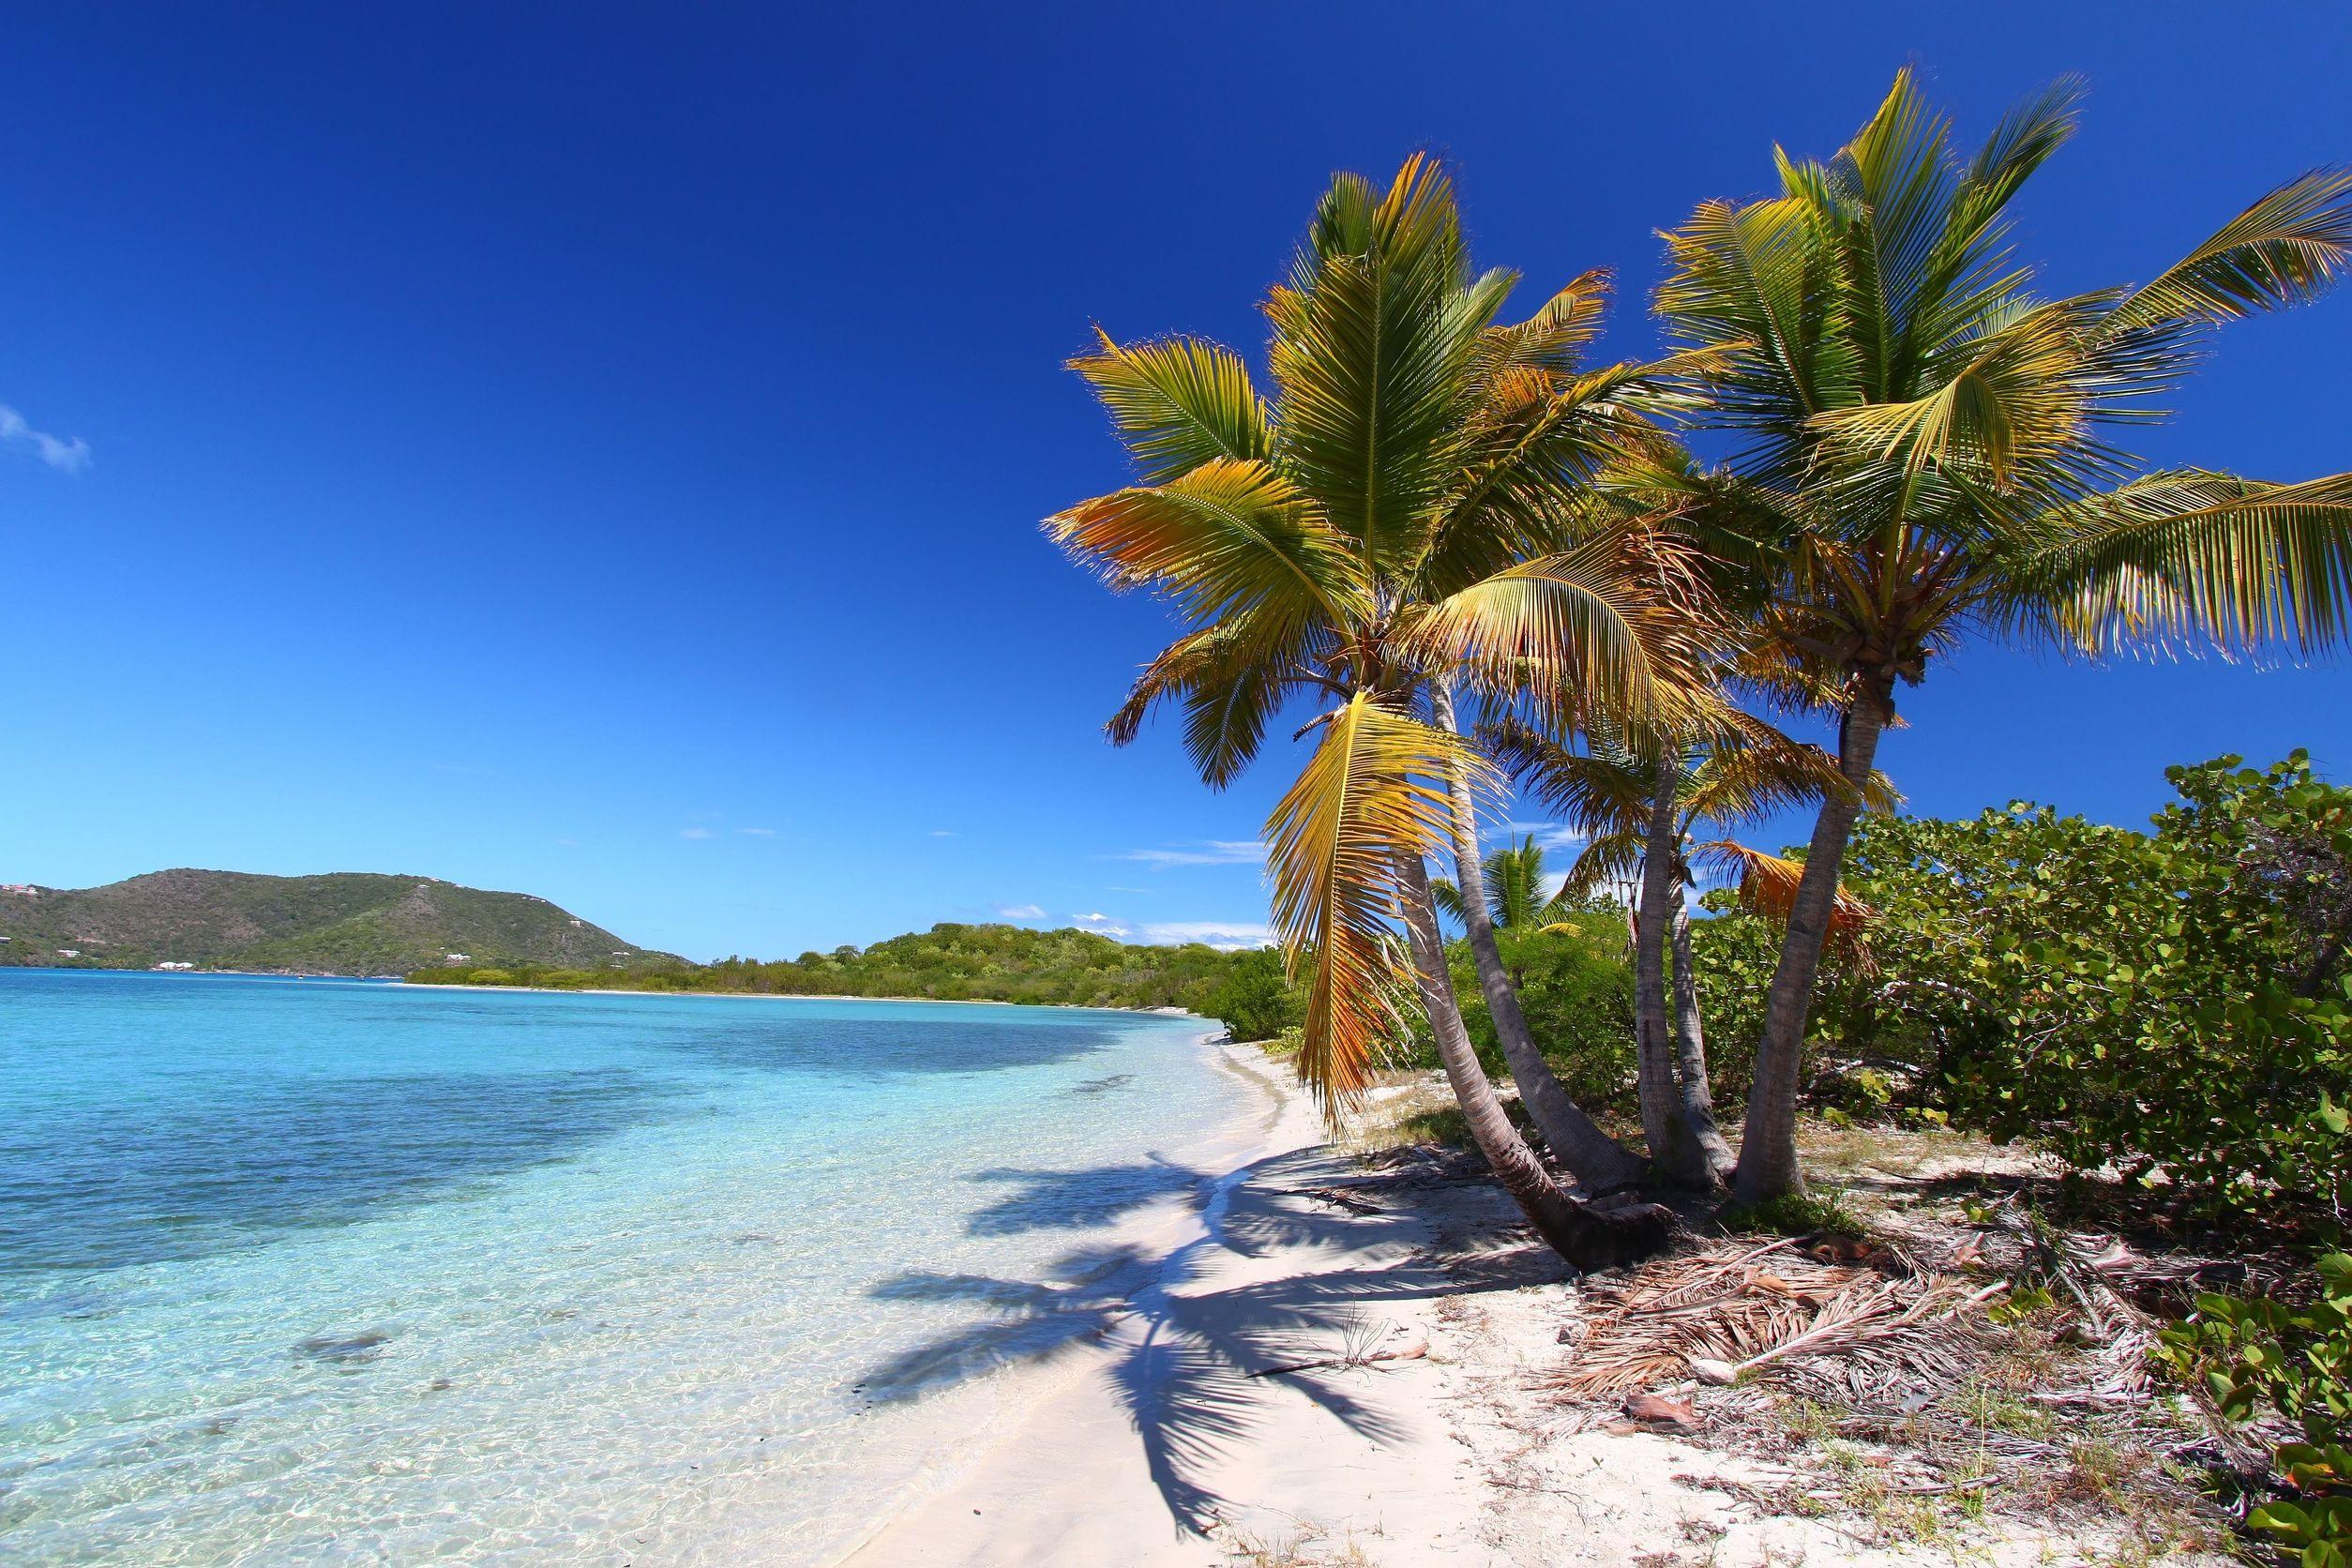 caribbean coastal trees 123rf